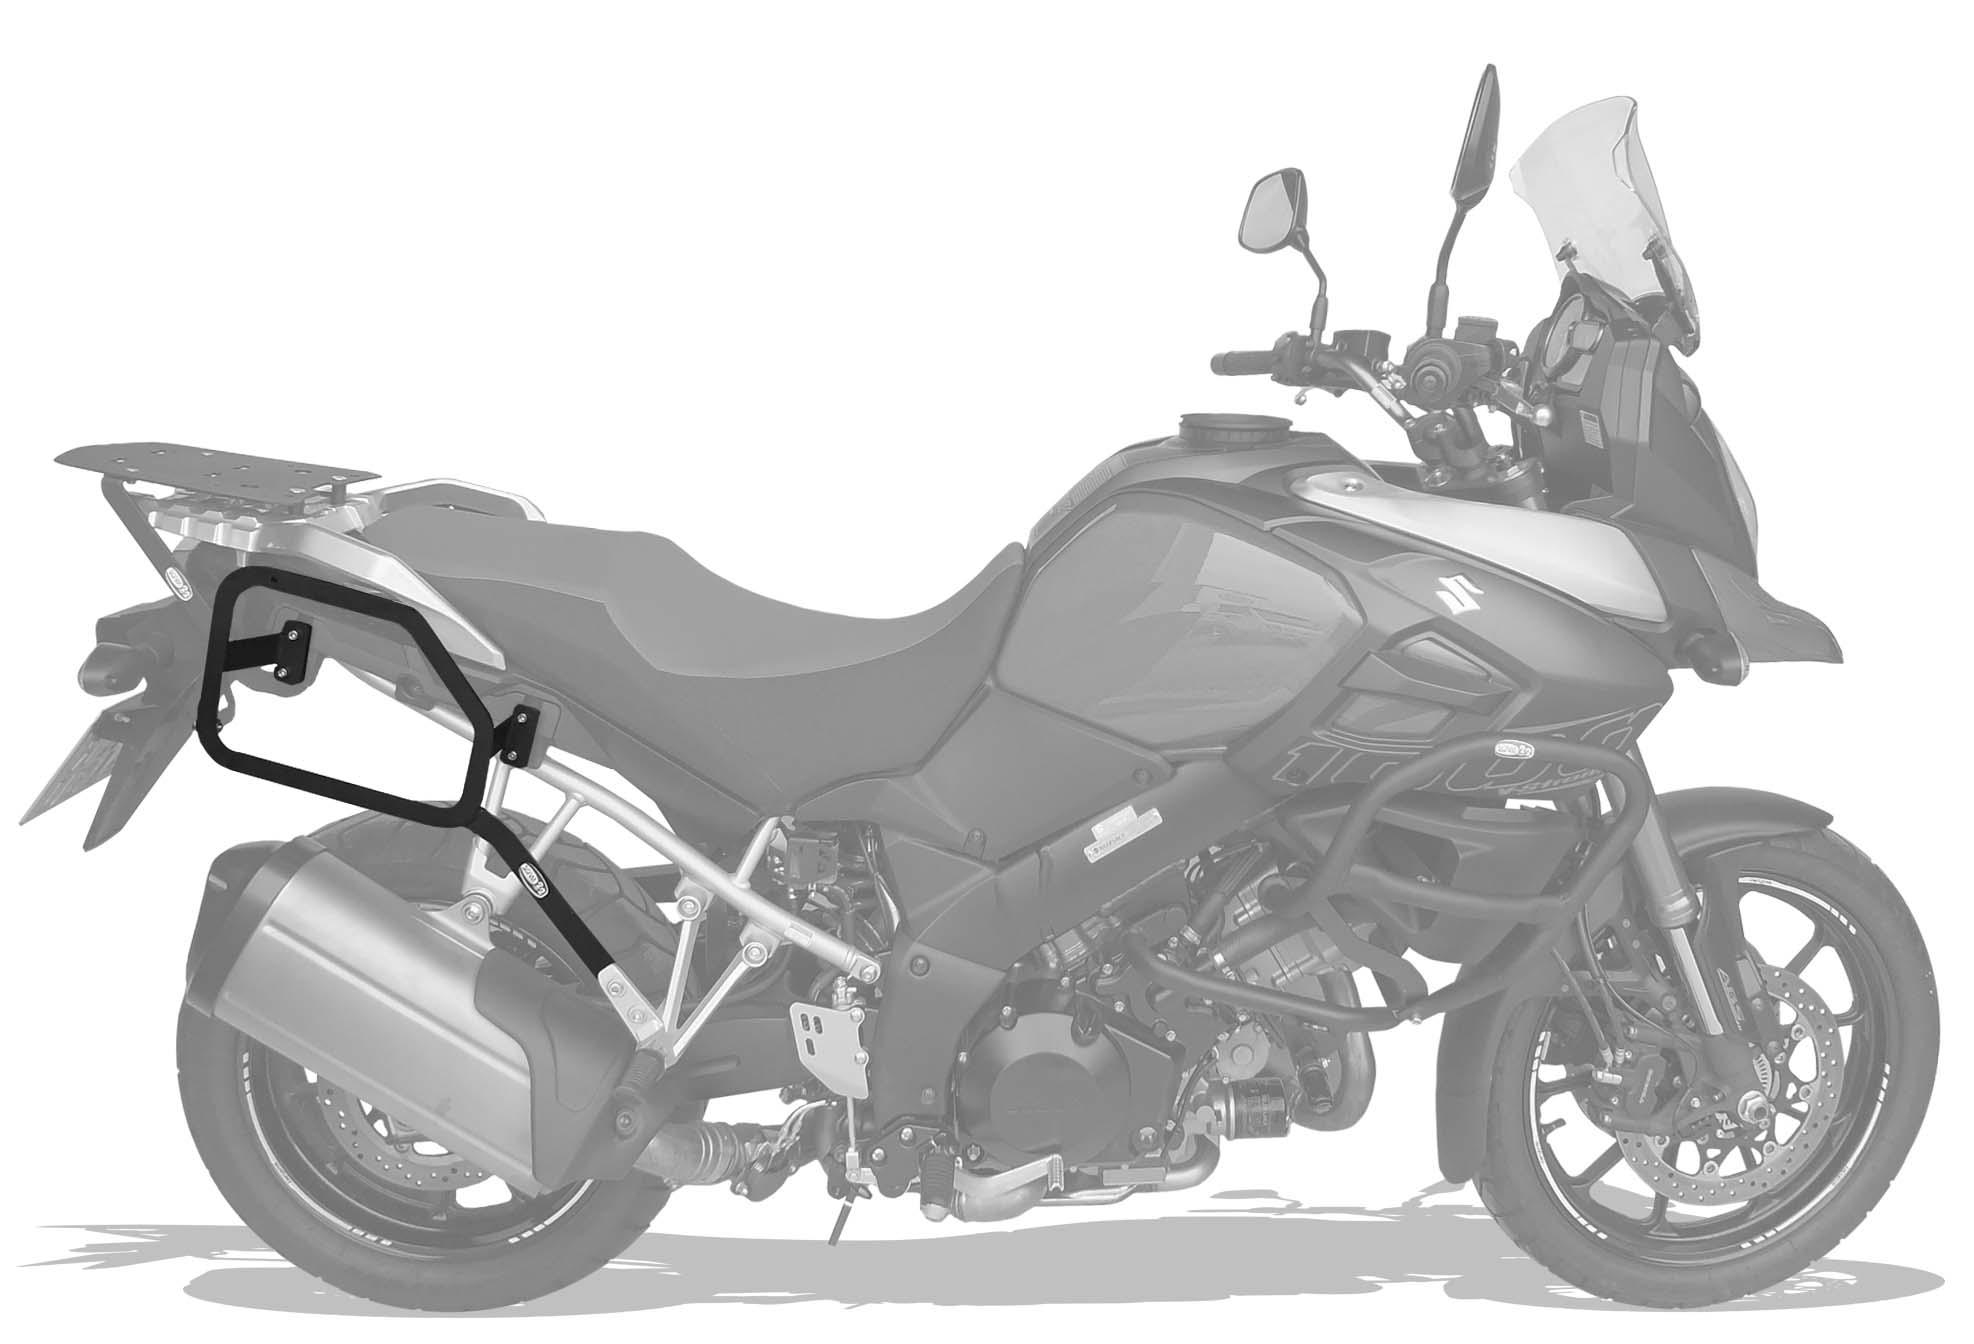 Afastador alforges Suzuki DL Vstrom 1000cc 2014+